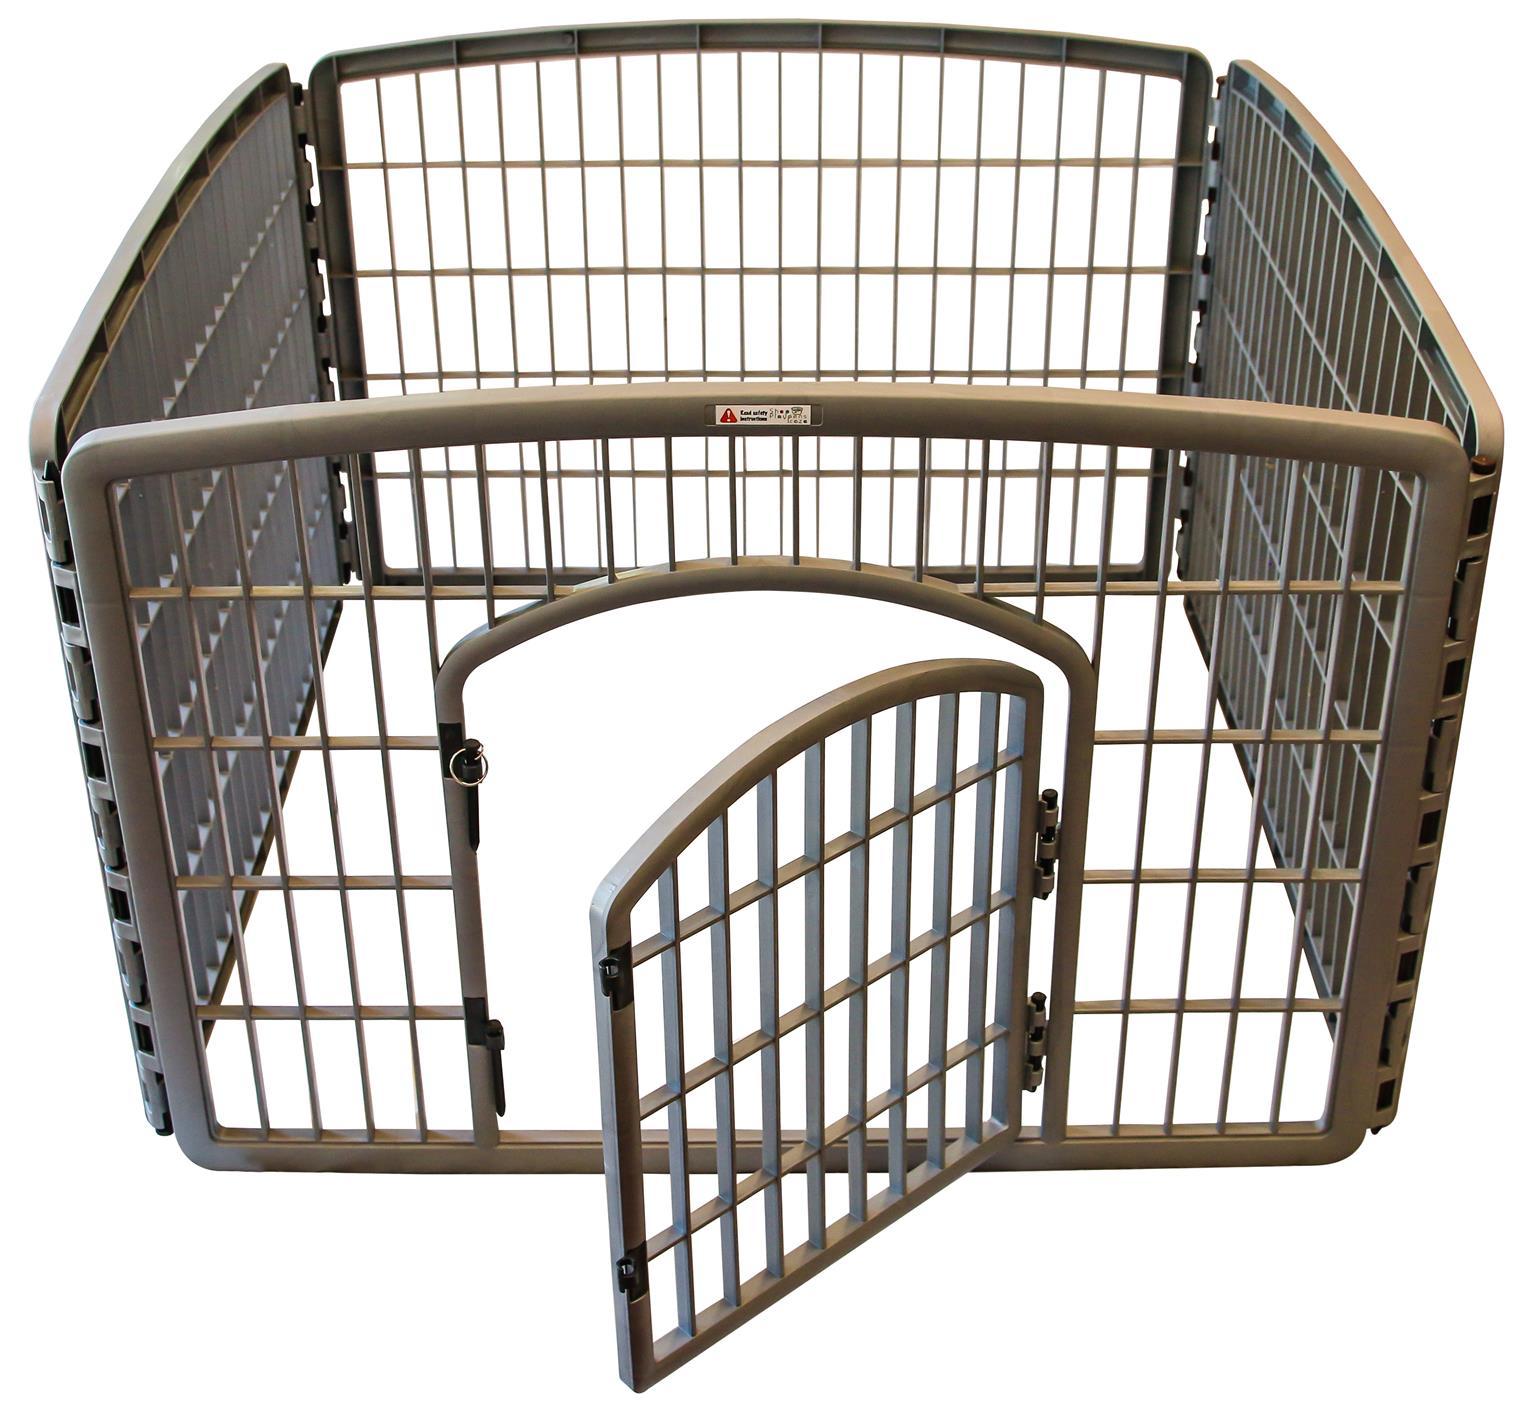 Grey pet playpen with gate [Plastic]